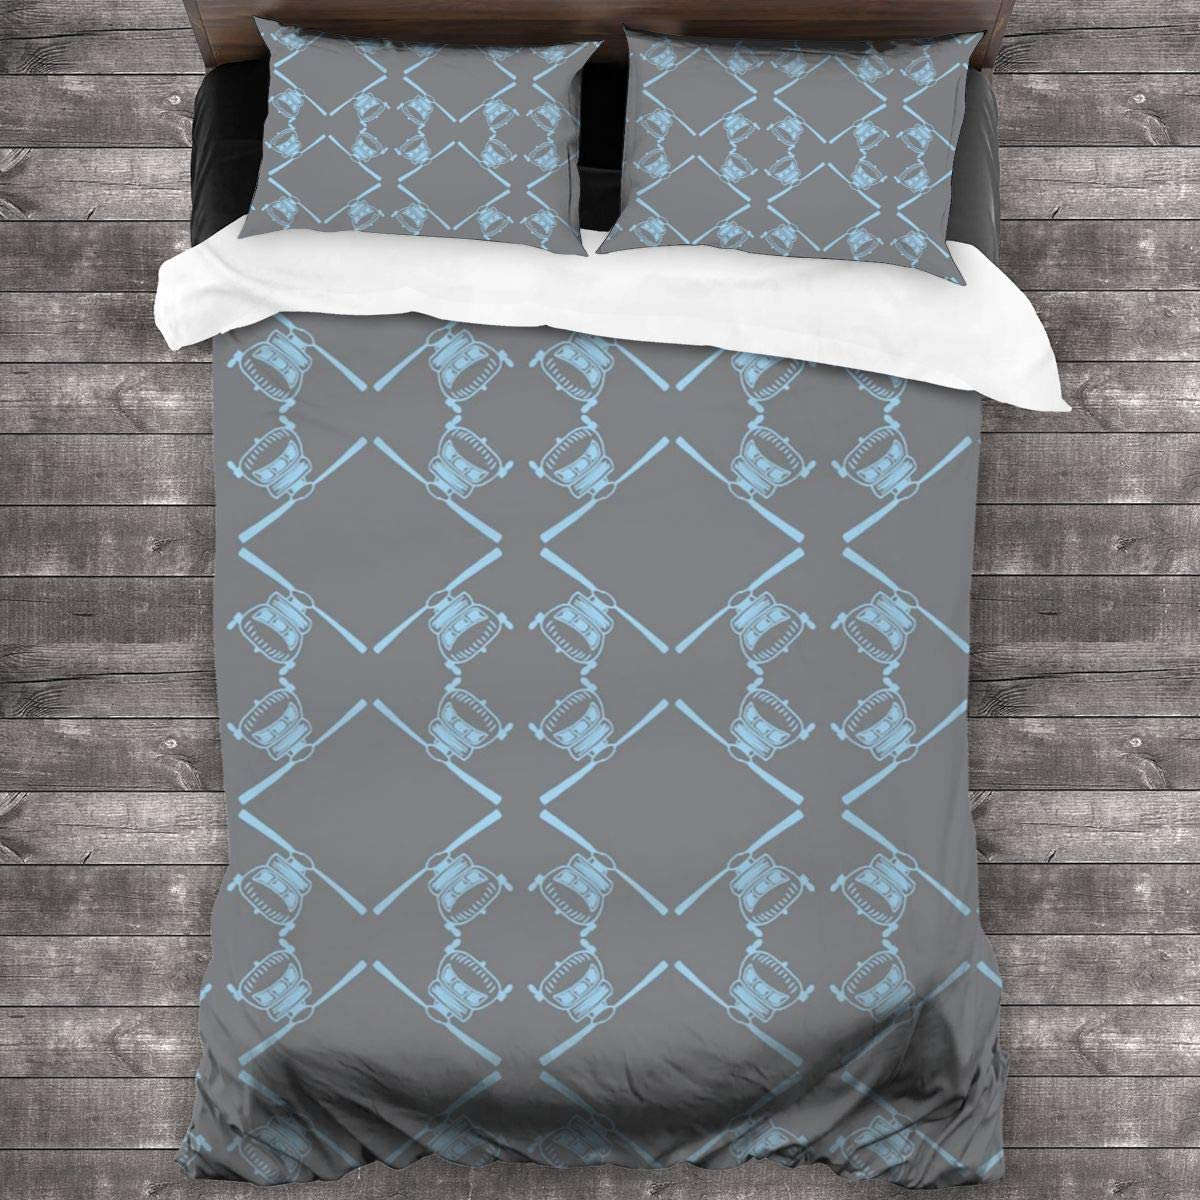 Darkess Bedding Set Black Hawk Baby Blue On Grey Soft Lightweight and Shrink Resistant Bedding Three-Piece